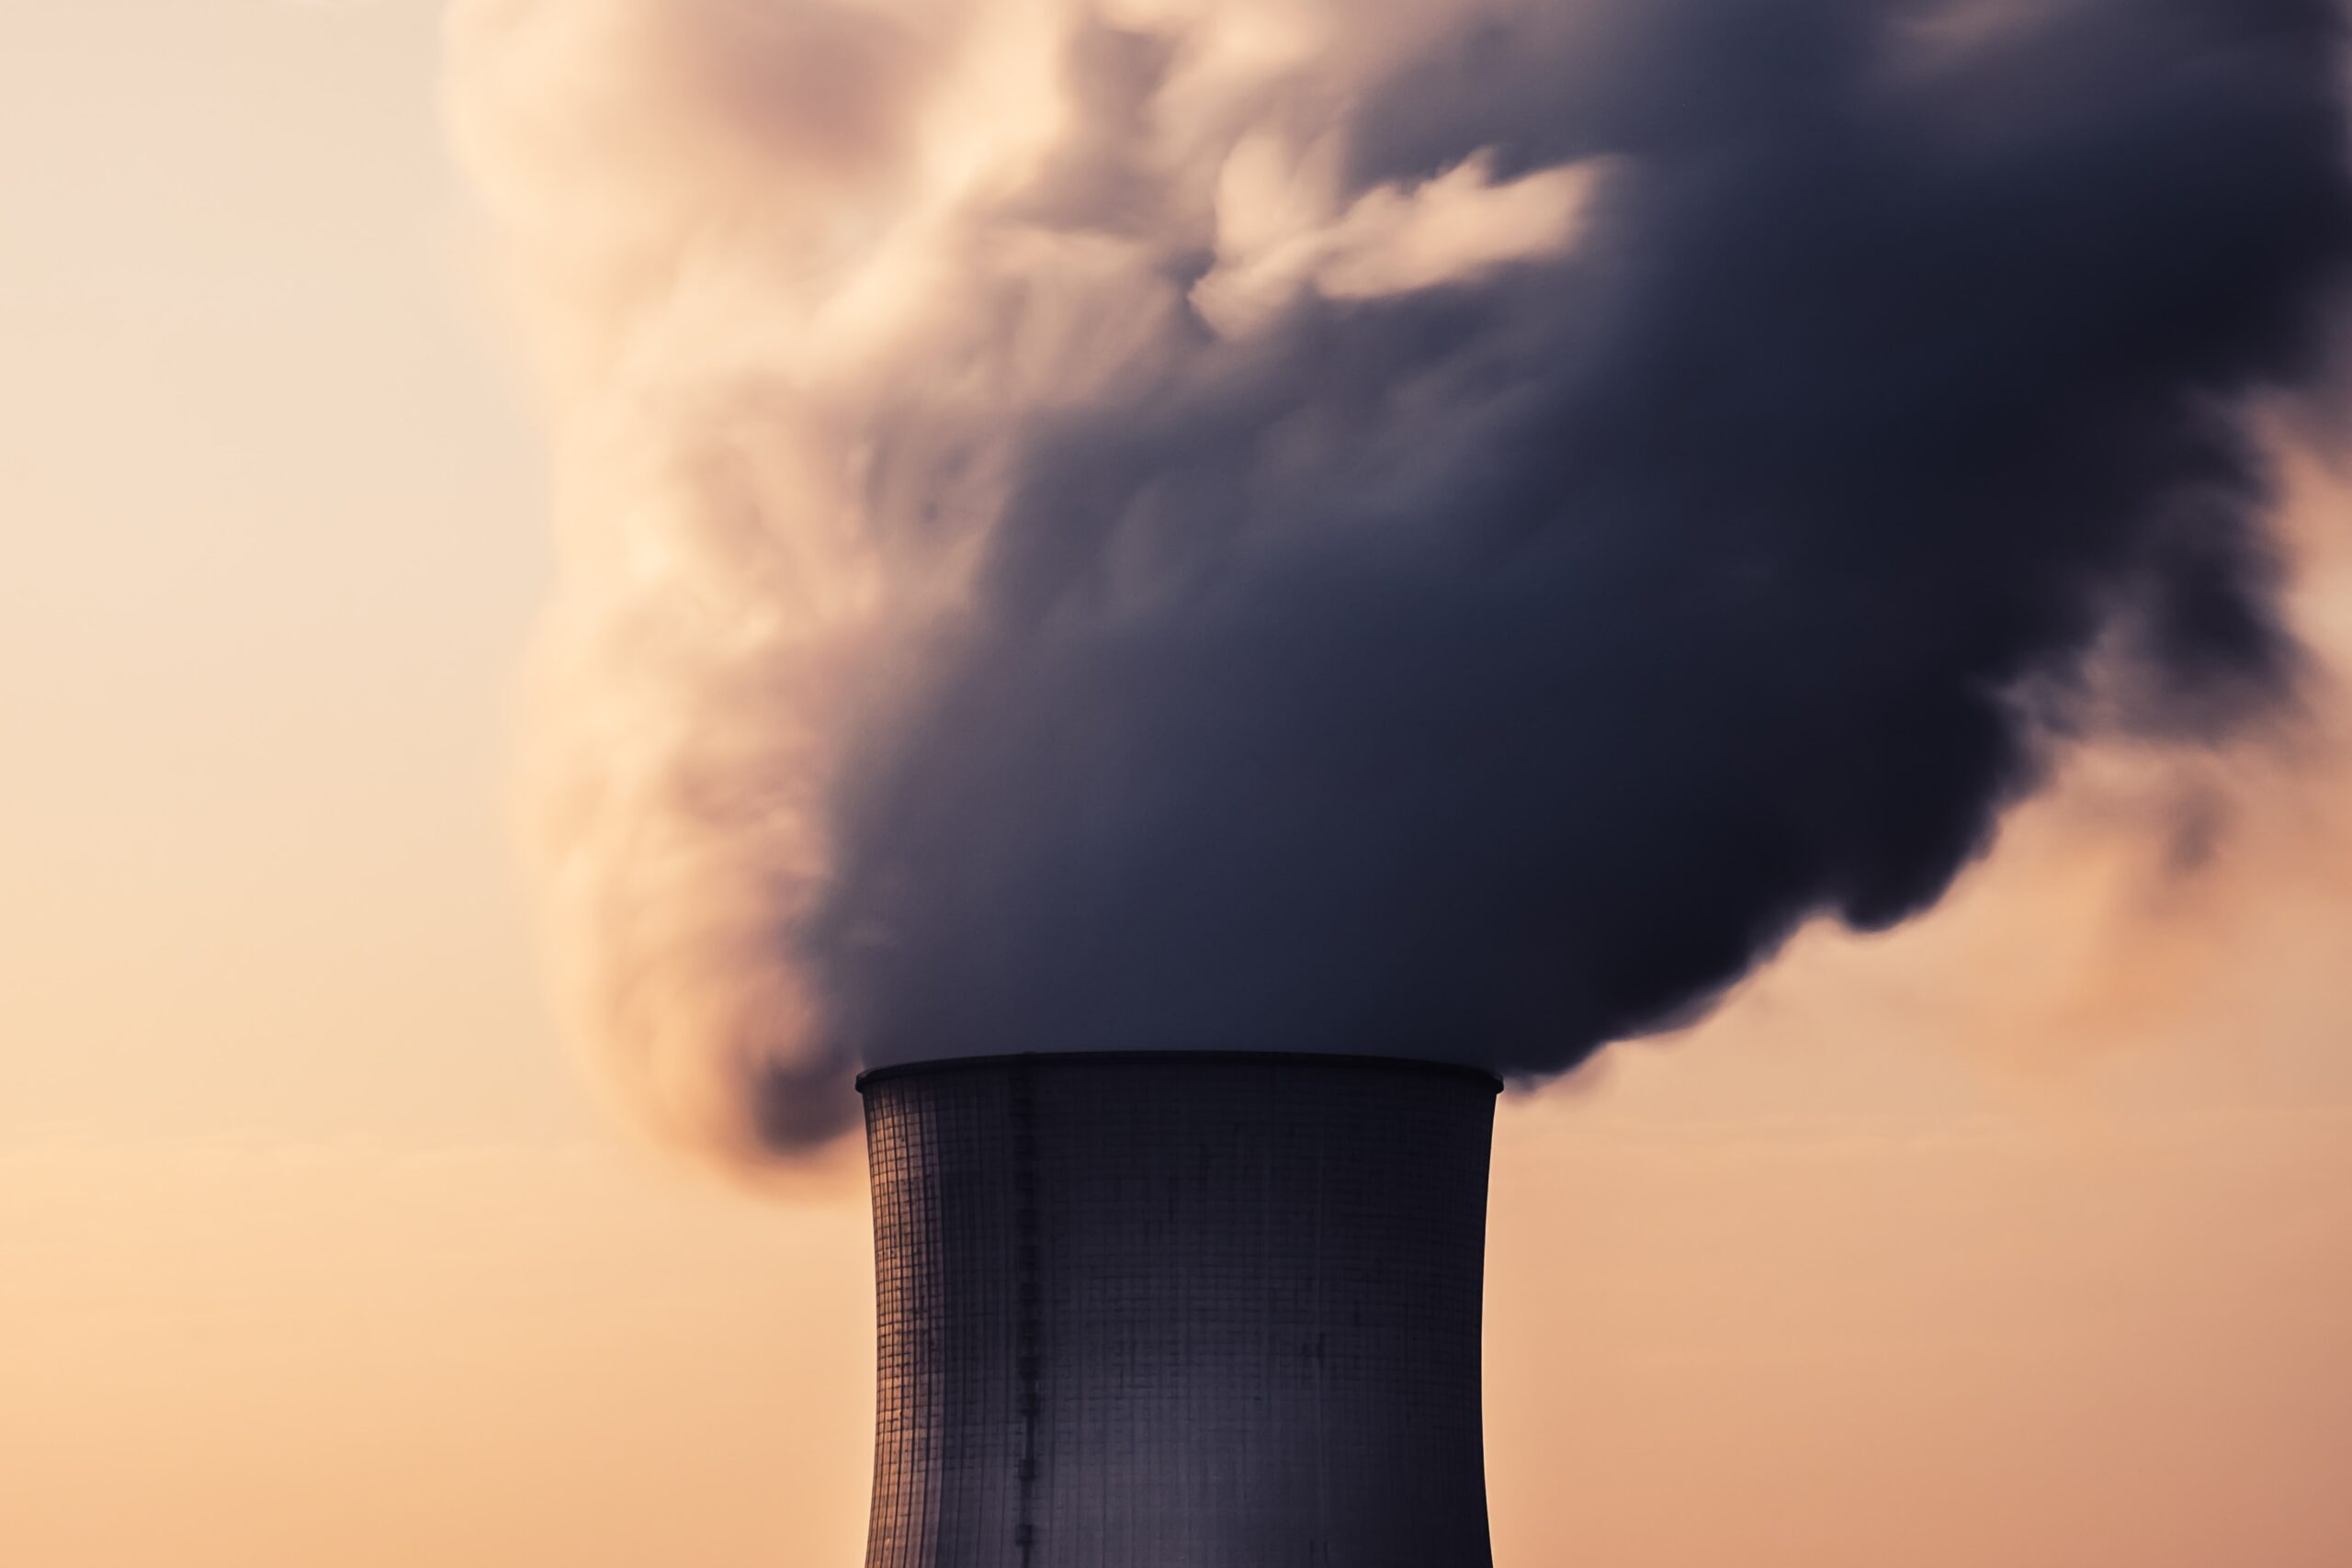 Fonti rinnovabili | Perché l'energia nucleare serve (e perché serve oggi)